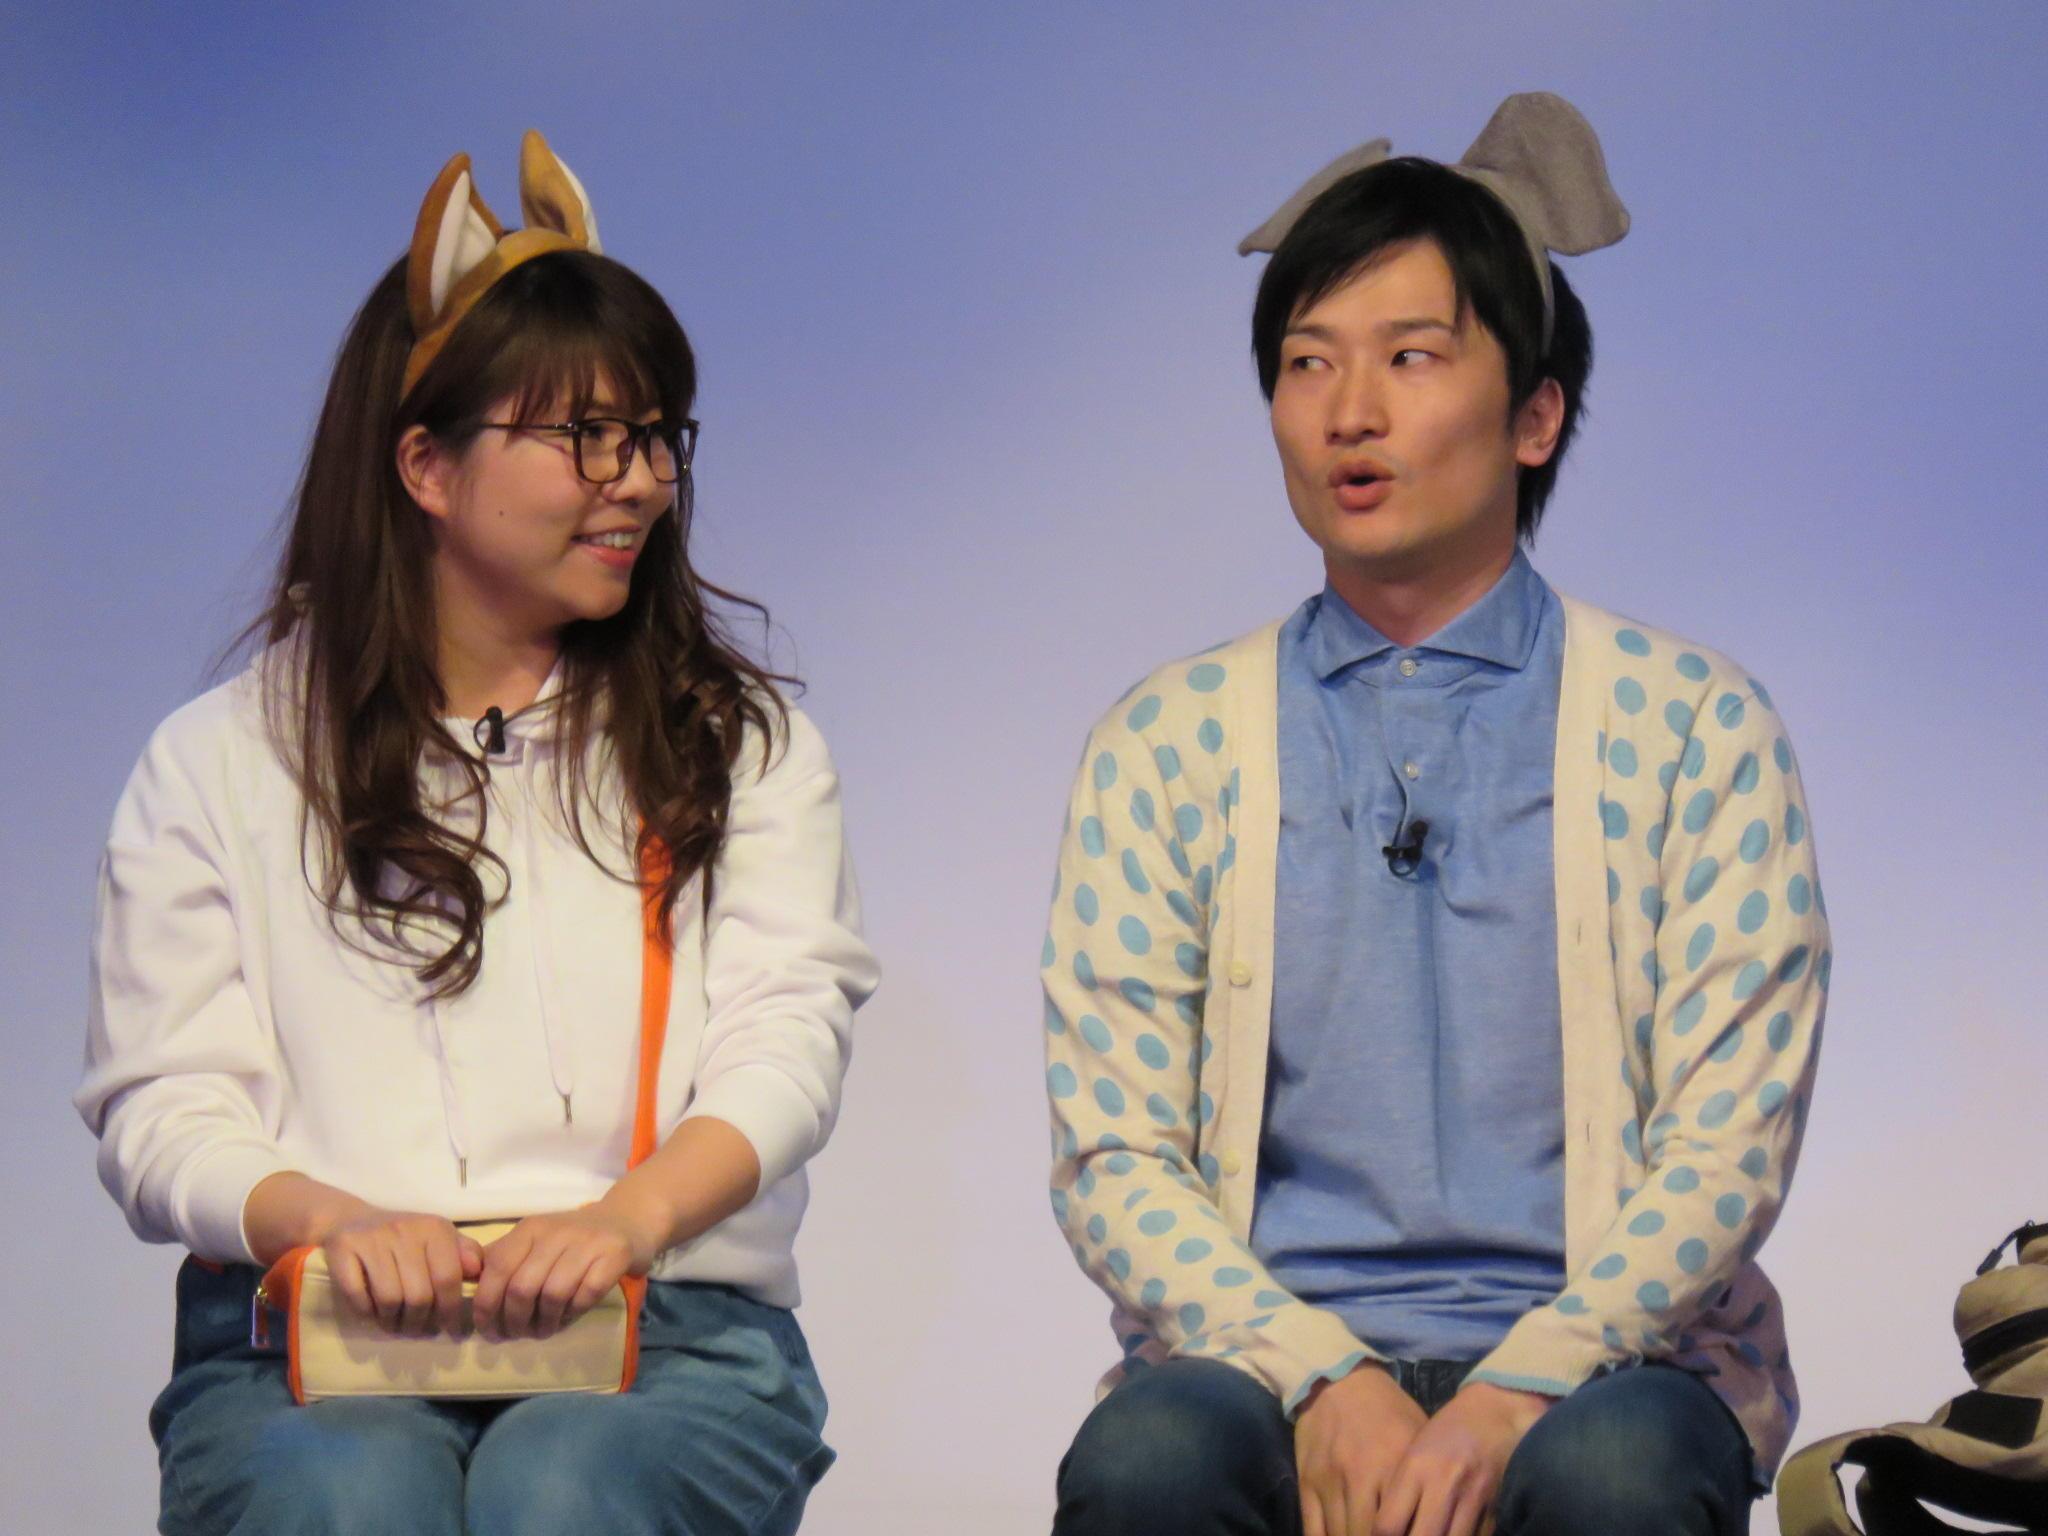 http://news.yoshimoto.co.jp/20170419153402-edf648d0d8cf1f03b297605d120d7901c3758300.jpg